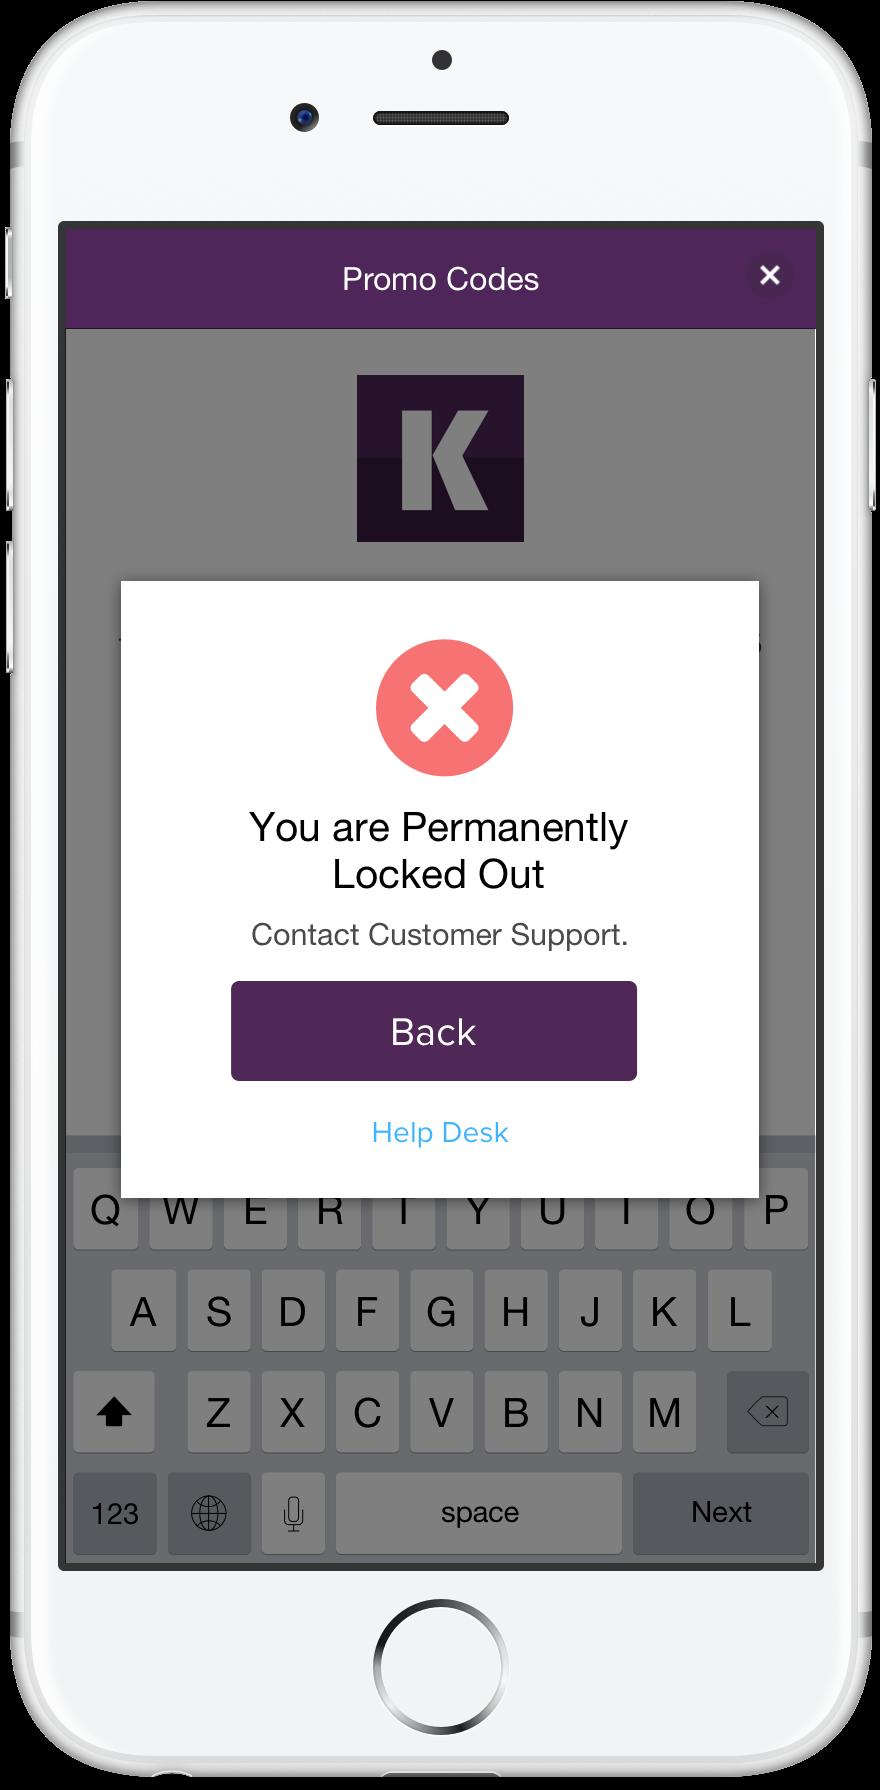 Koalla Mobile Promo Codes Permanent.png